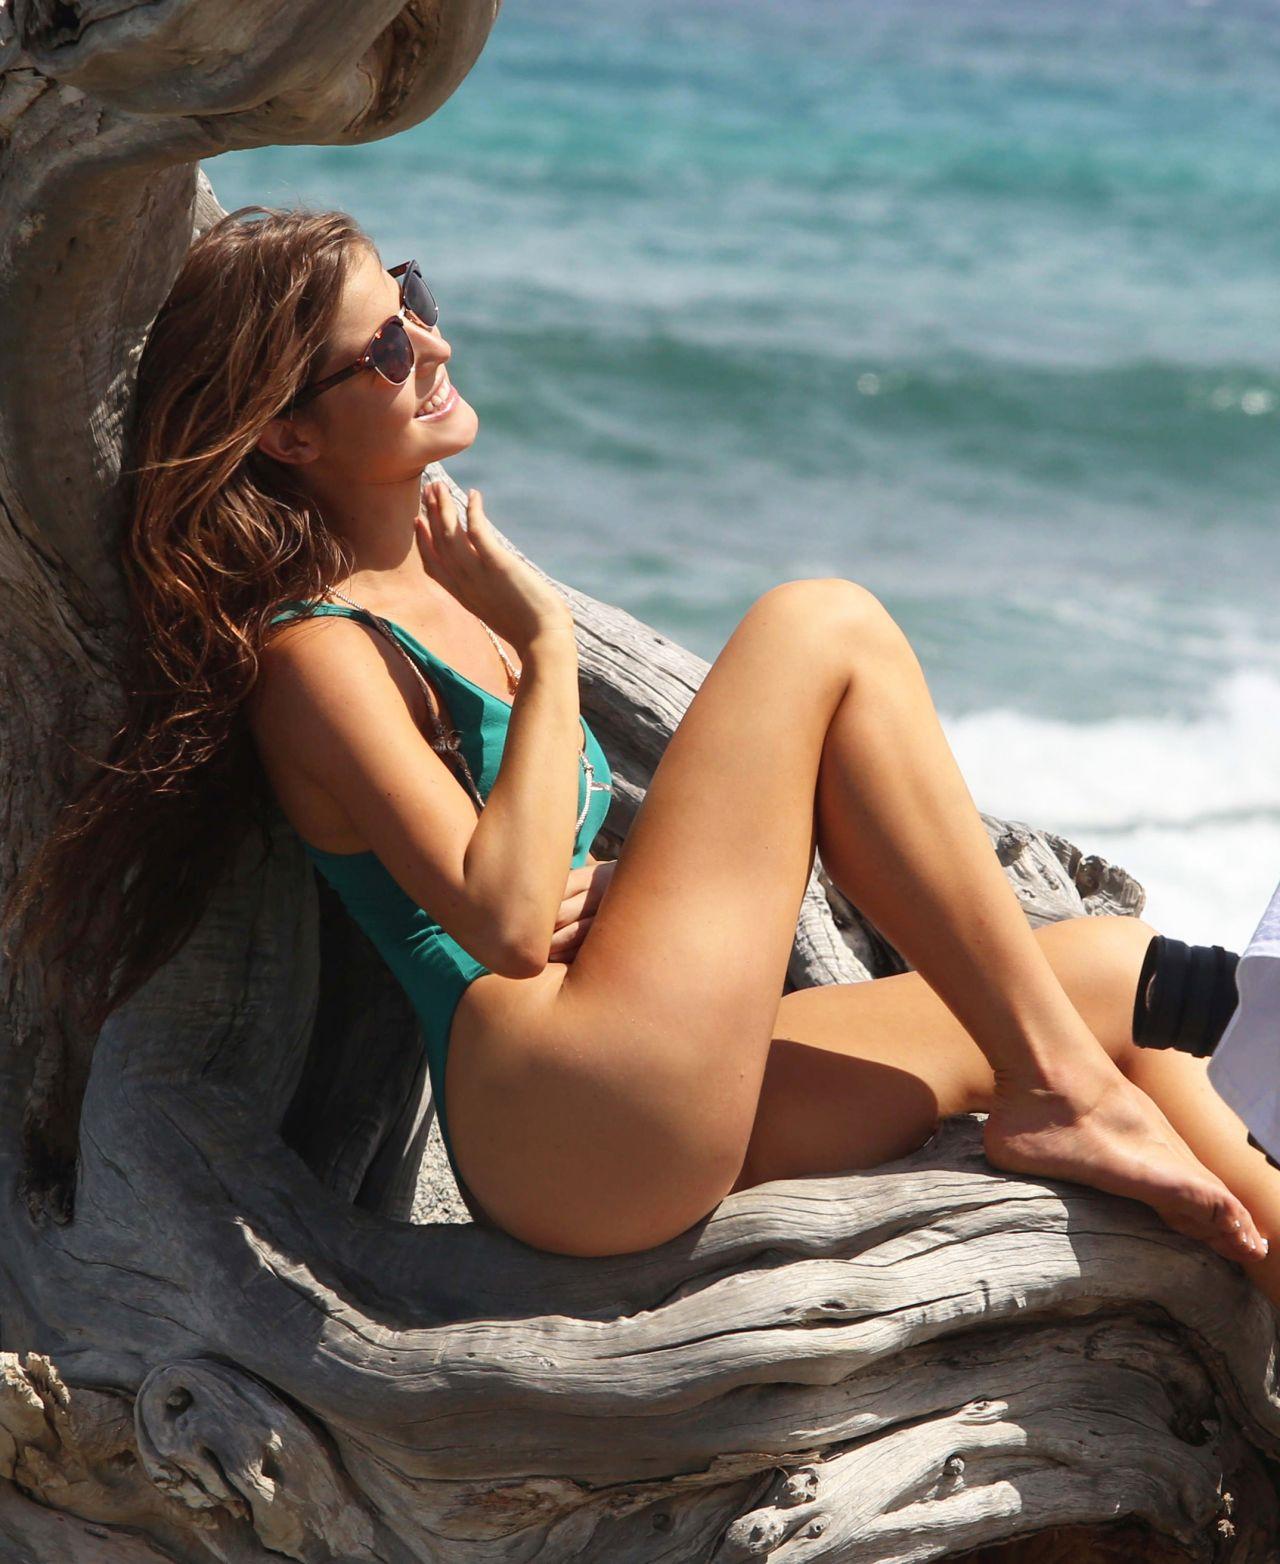 Amanda Cerny Shooting A Music Video In Aruba September